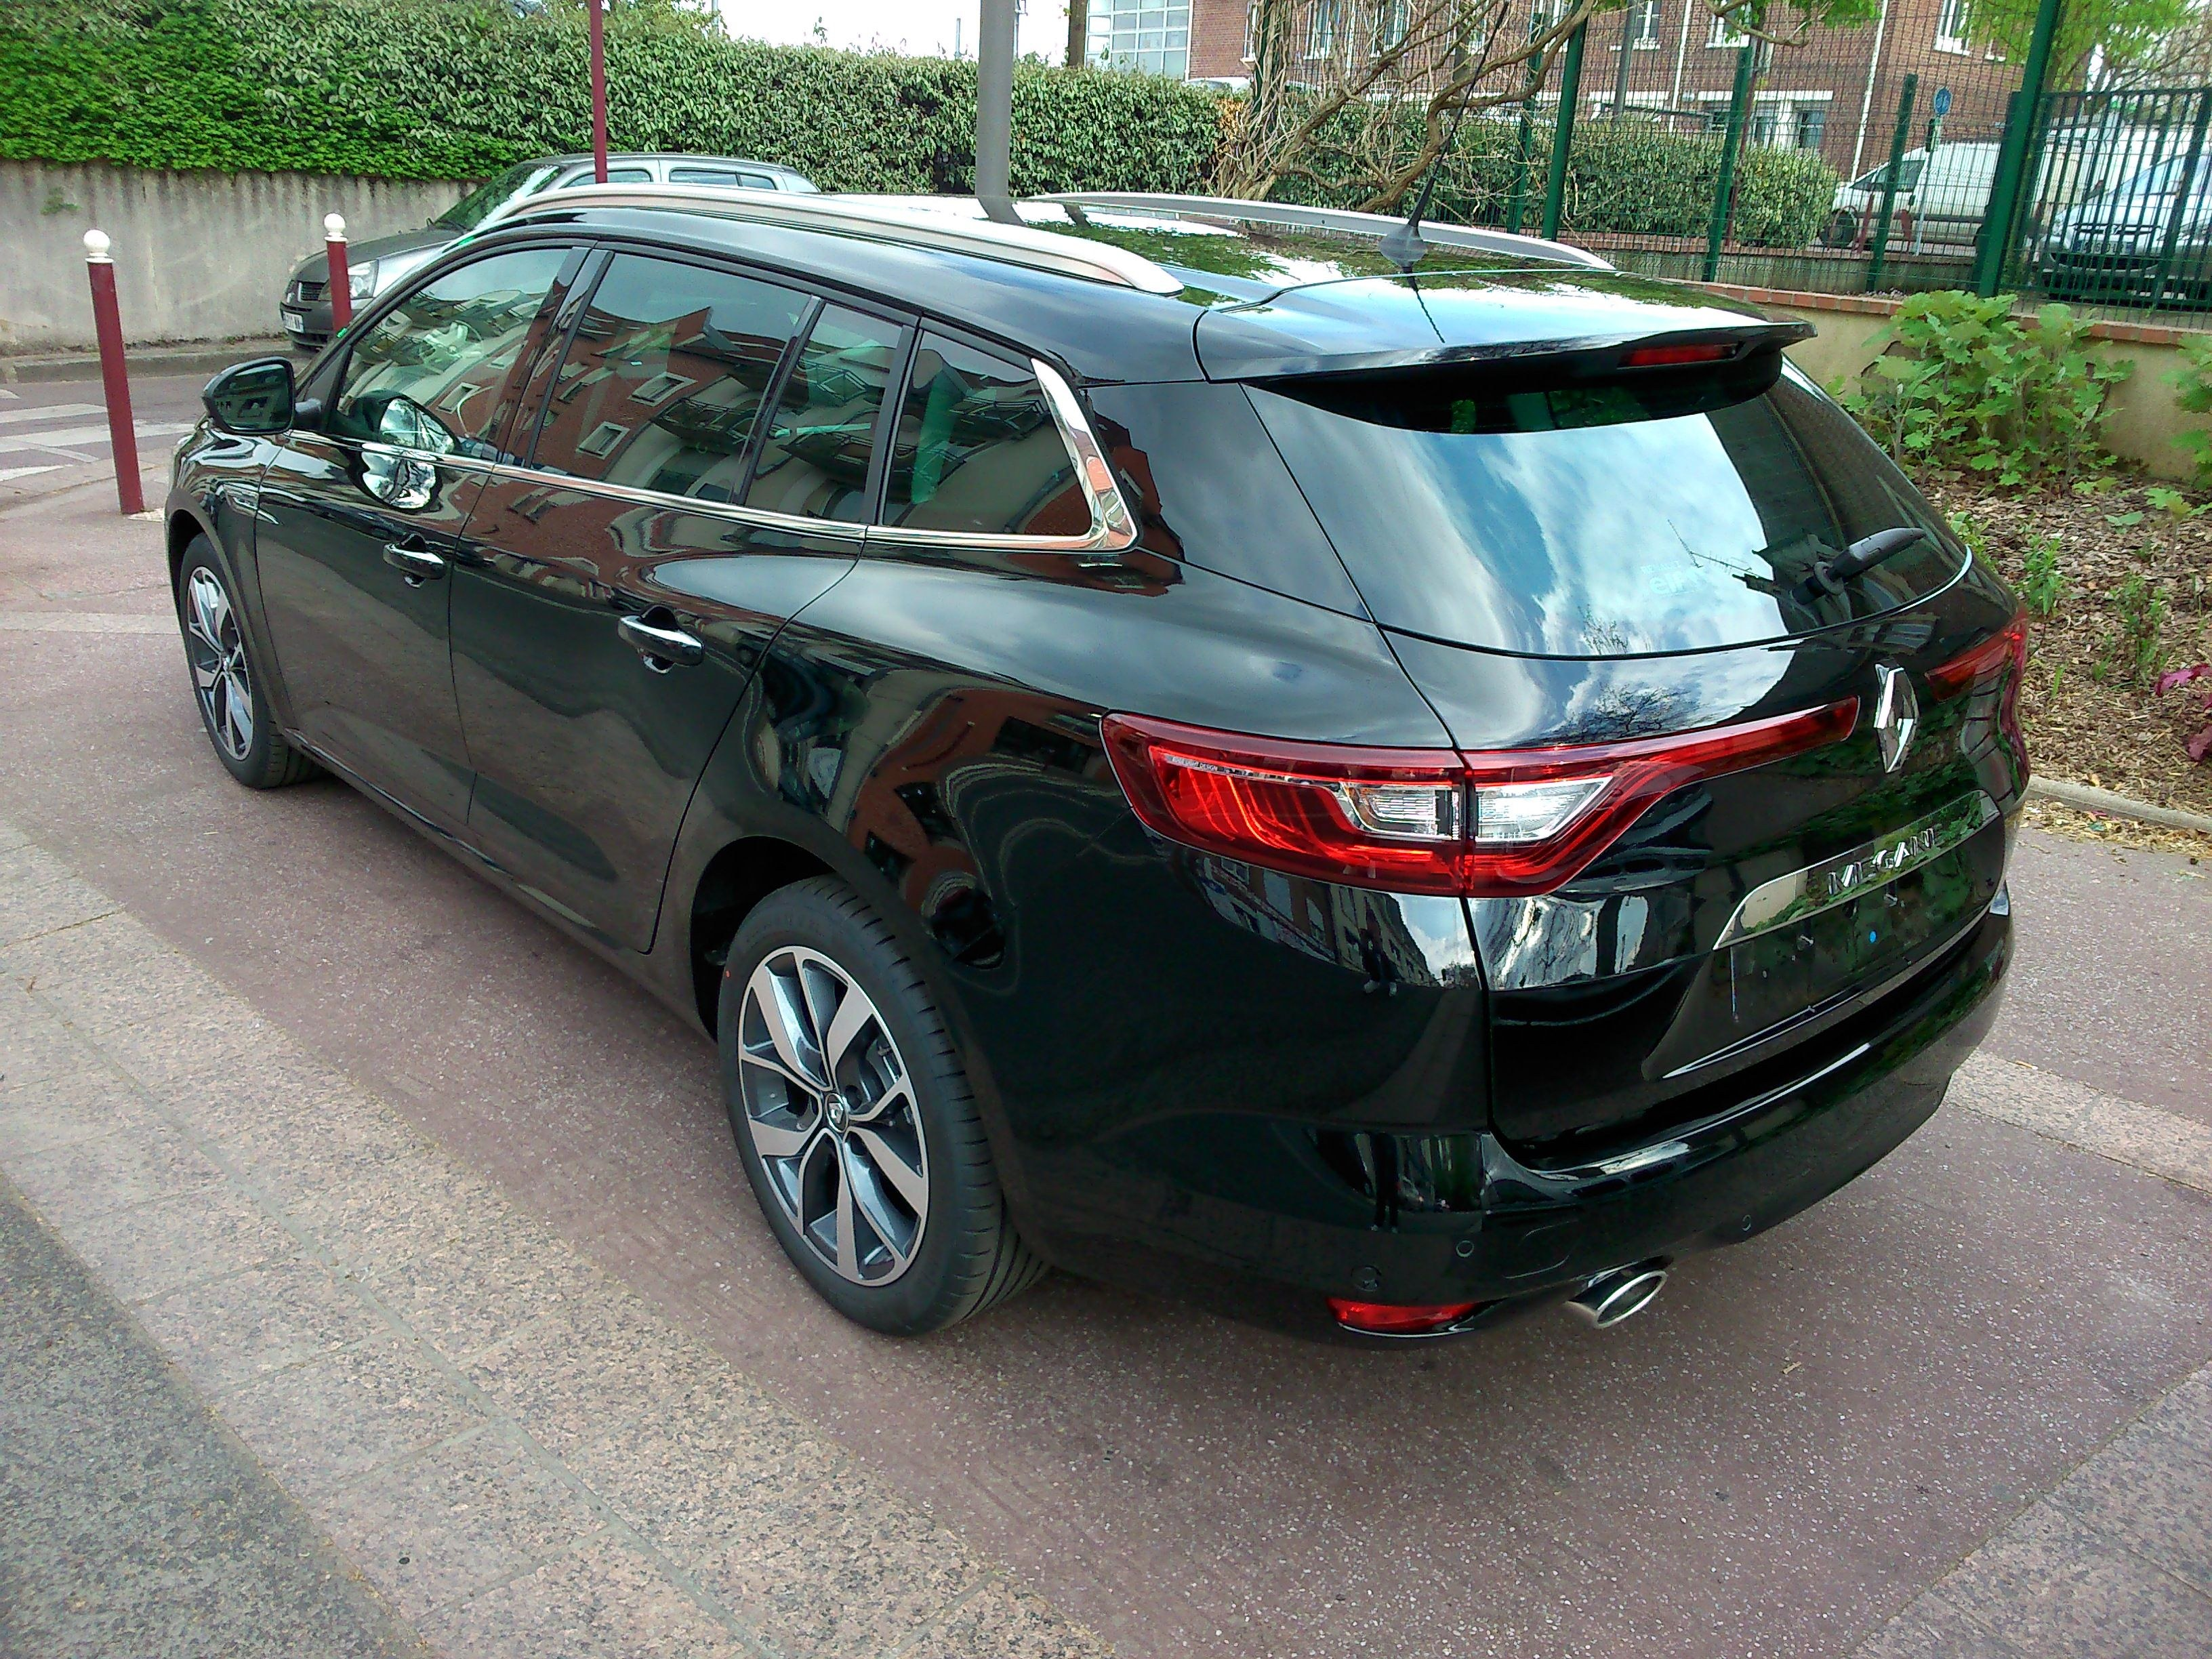 Mandataire auto Beauvais Picardie Renault Megane Estate Bose Edition Tce Dci Edc